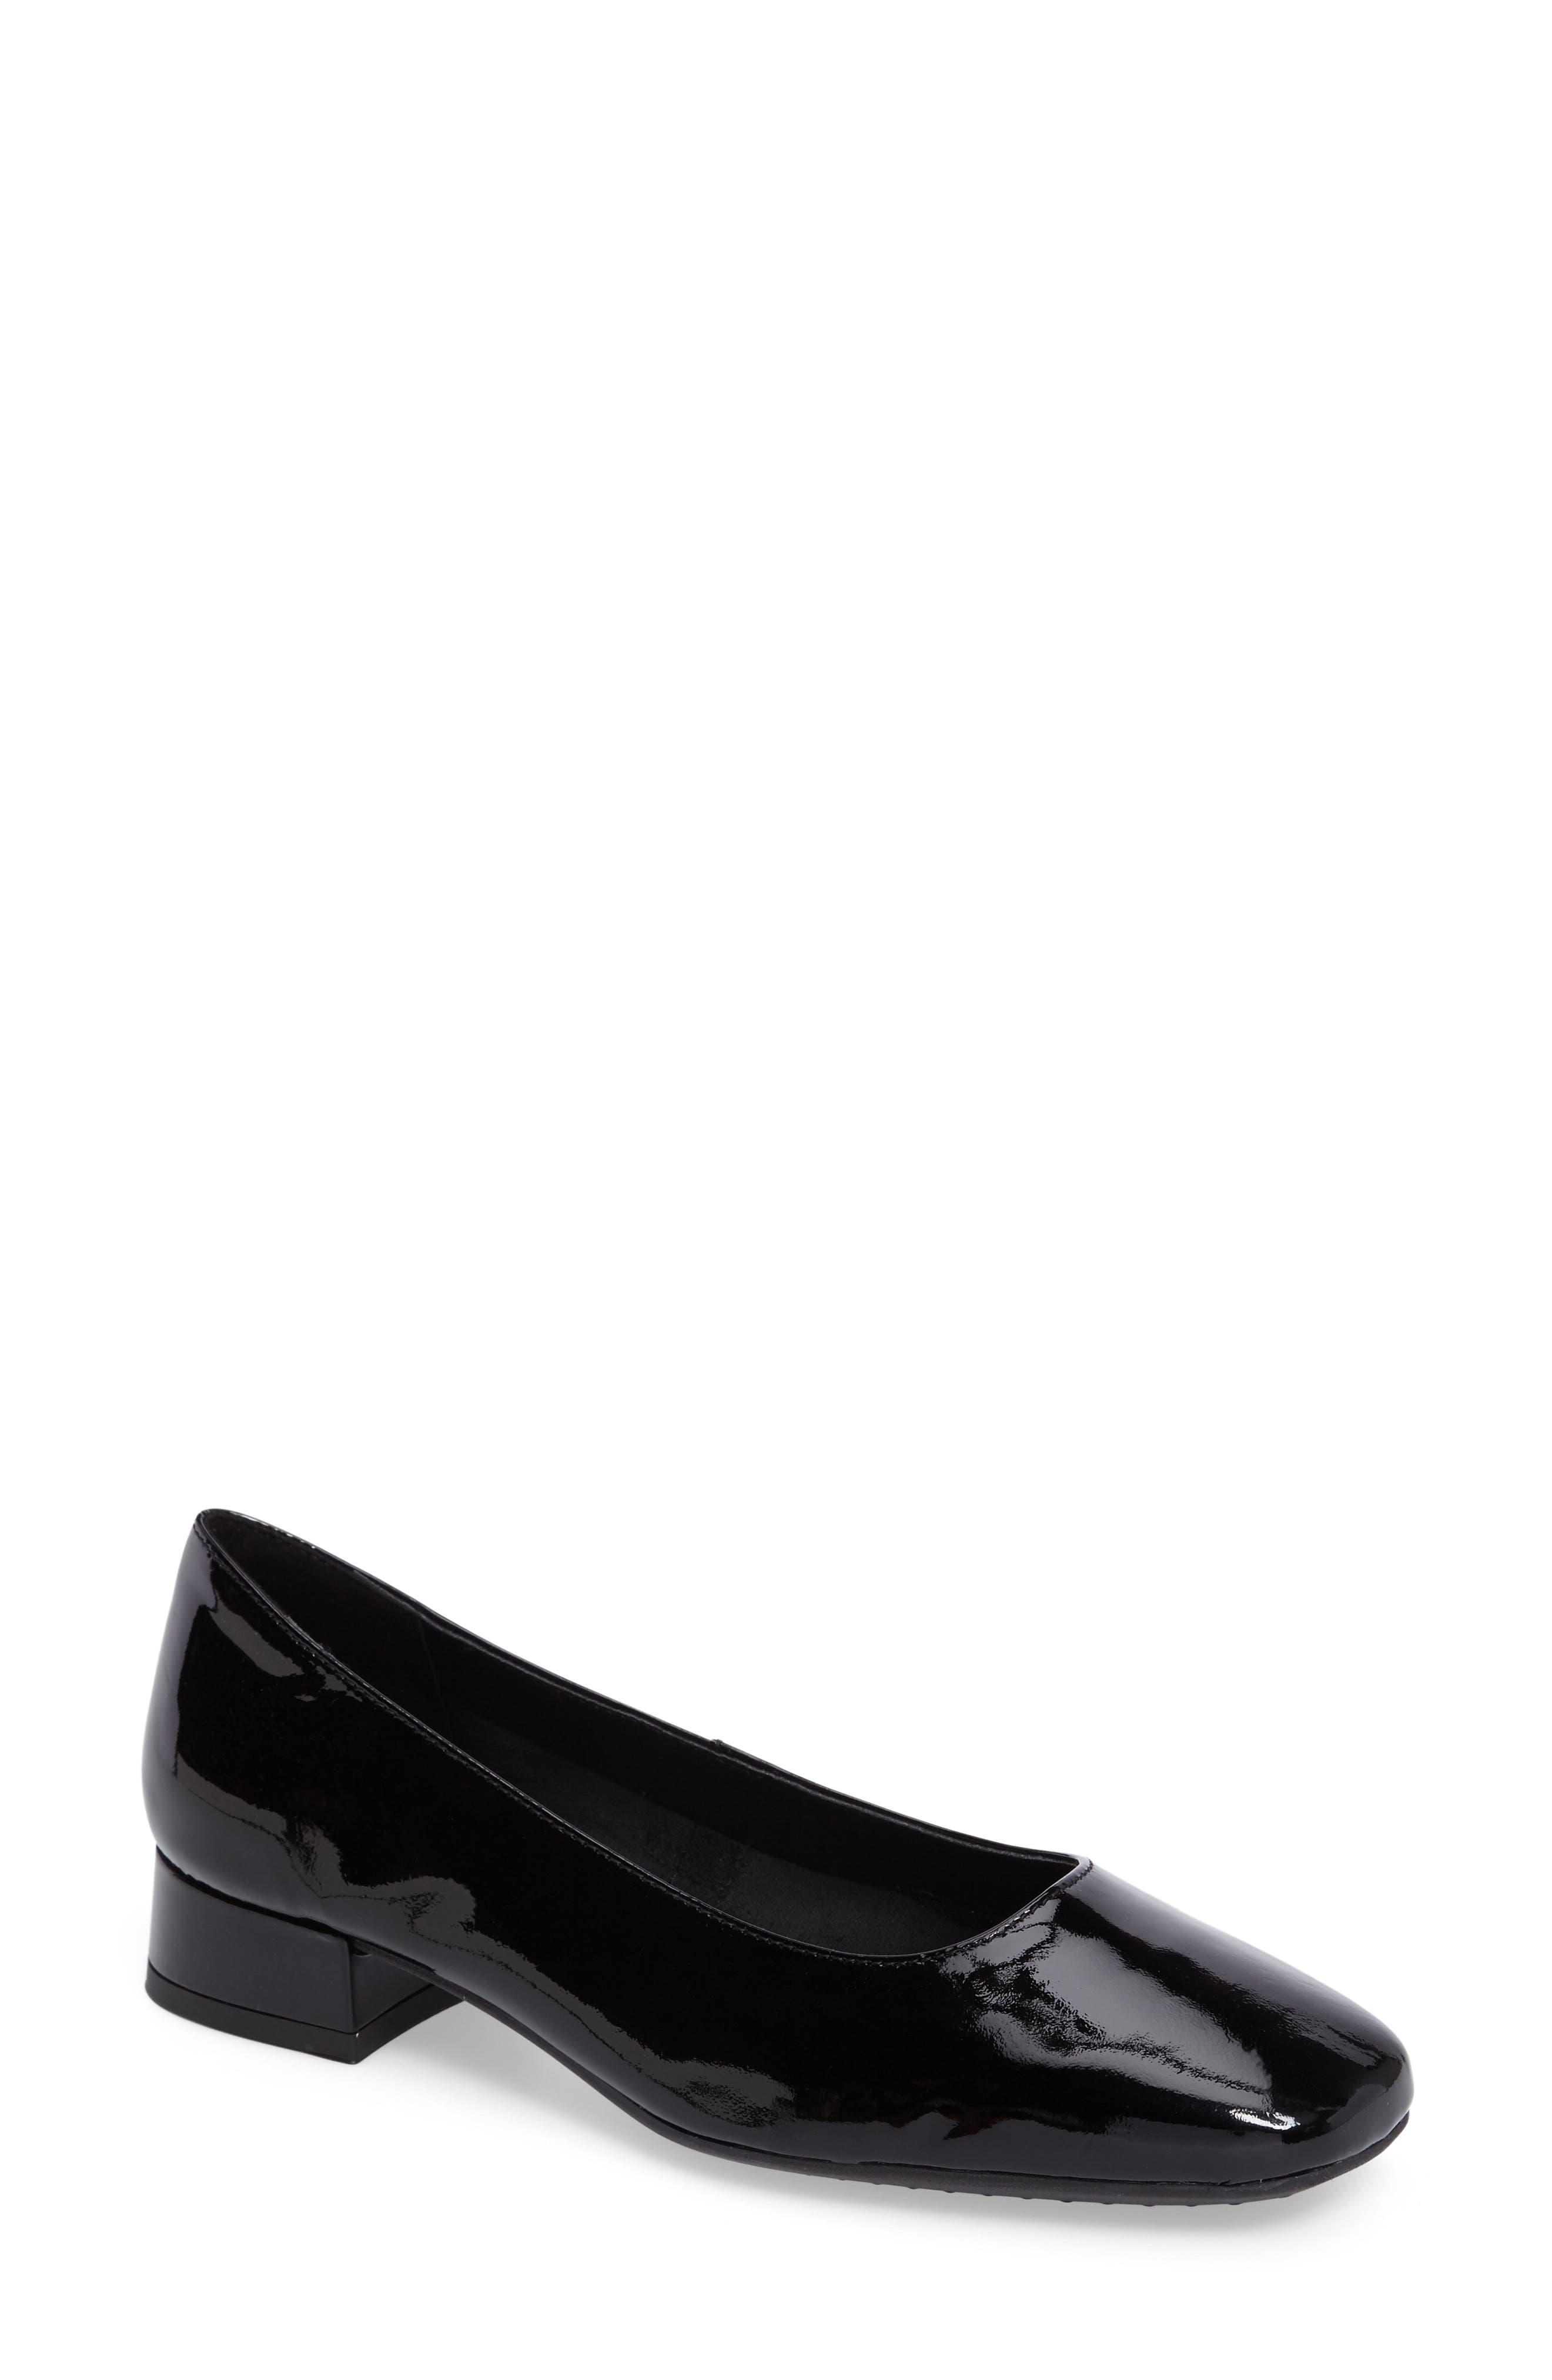 'Longly' Square Toe Pump,                         Main,                         color, Black Patent Leather